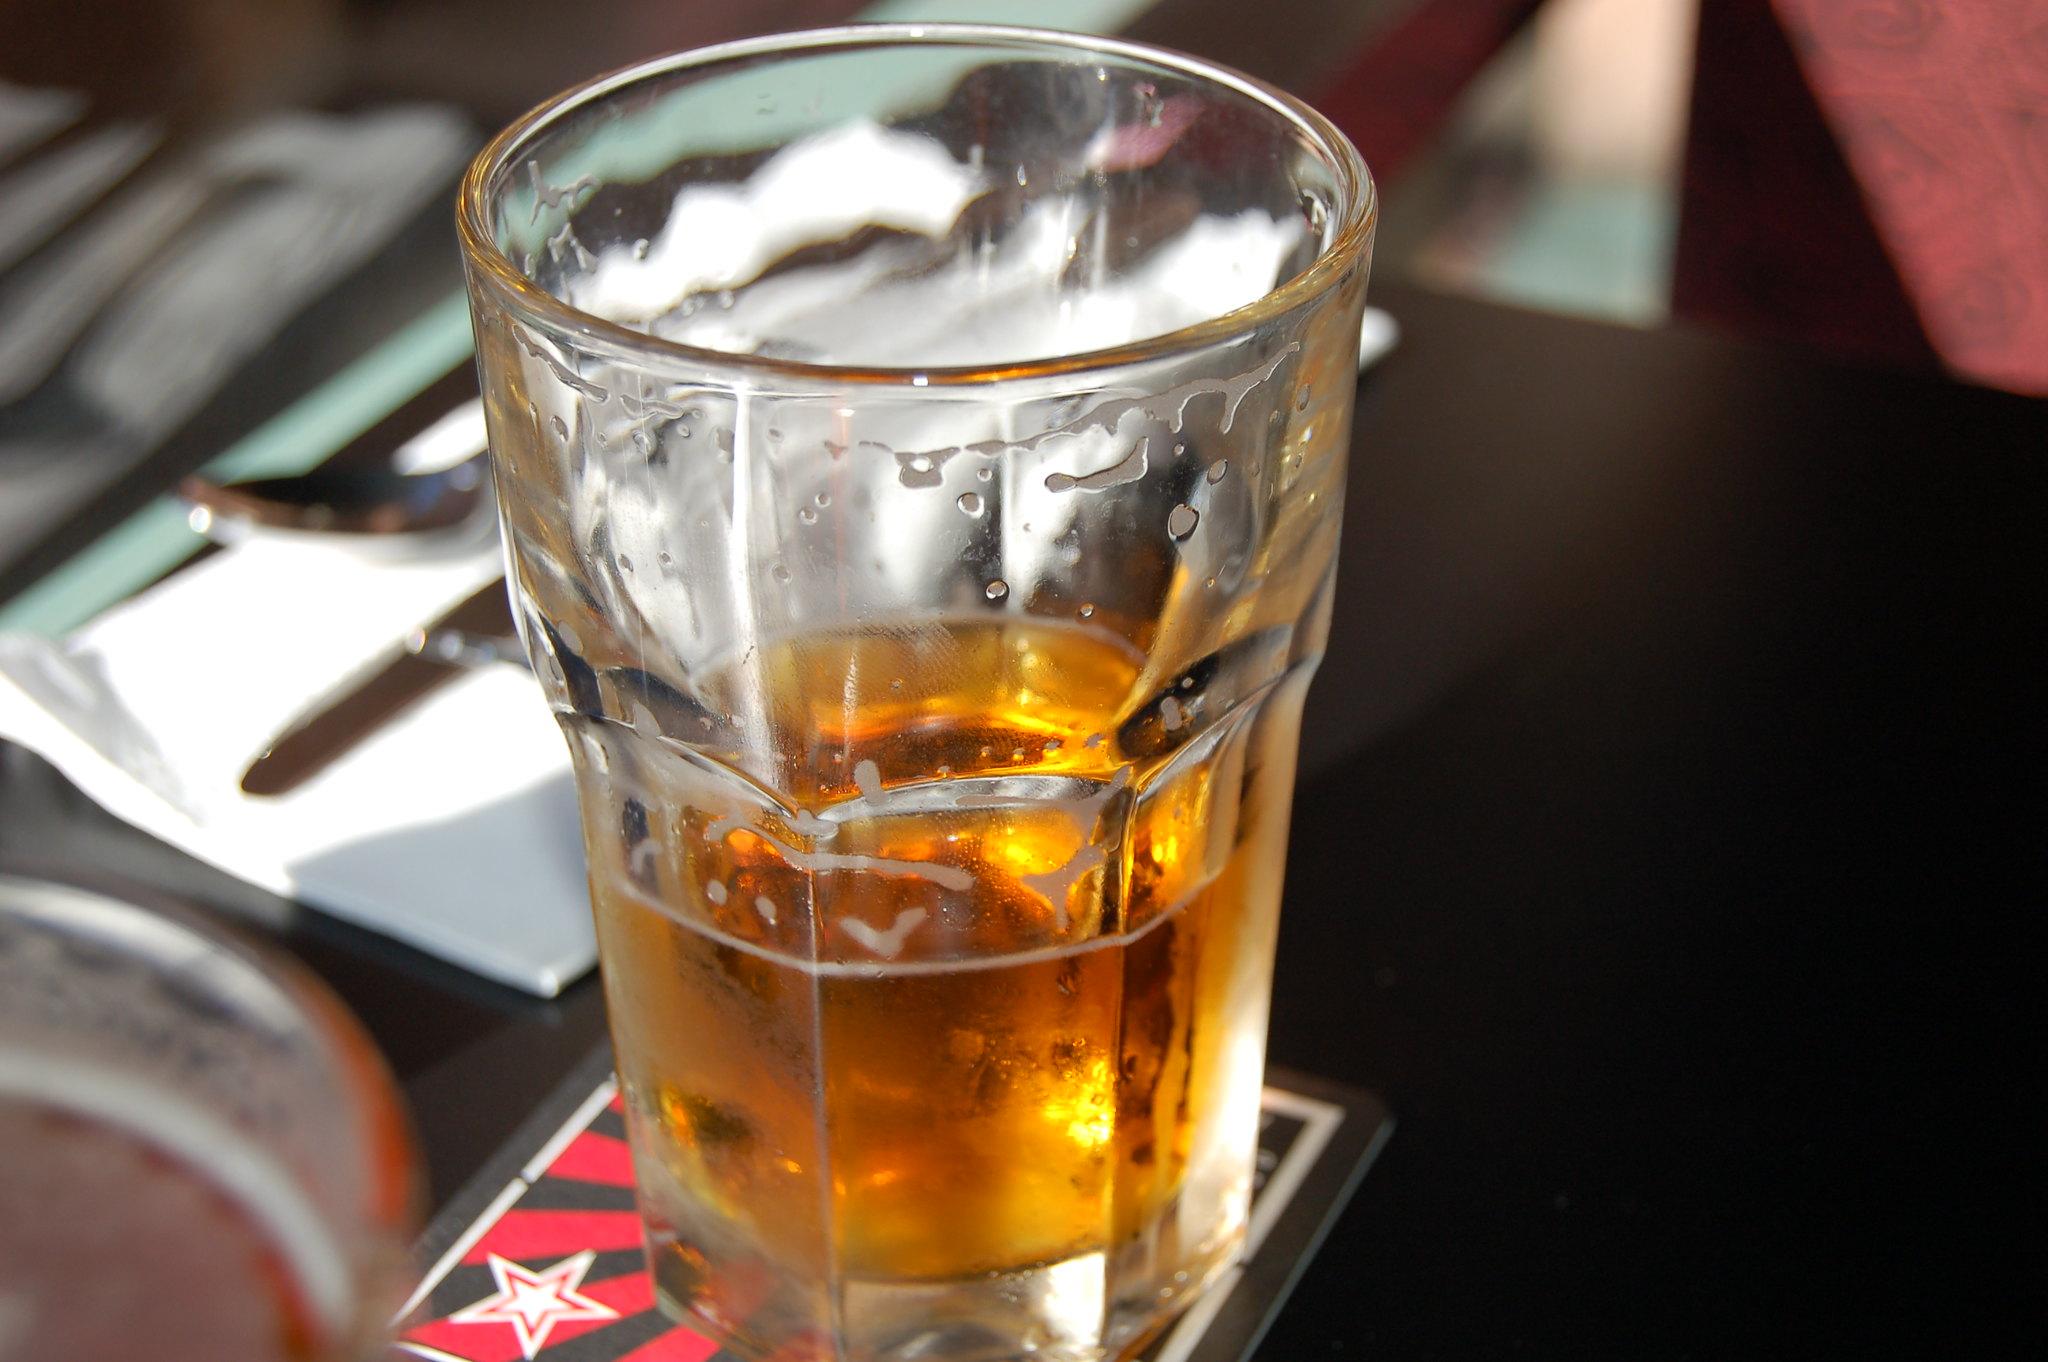 A half-drank beer sits on a dark bar.